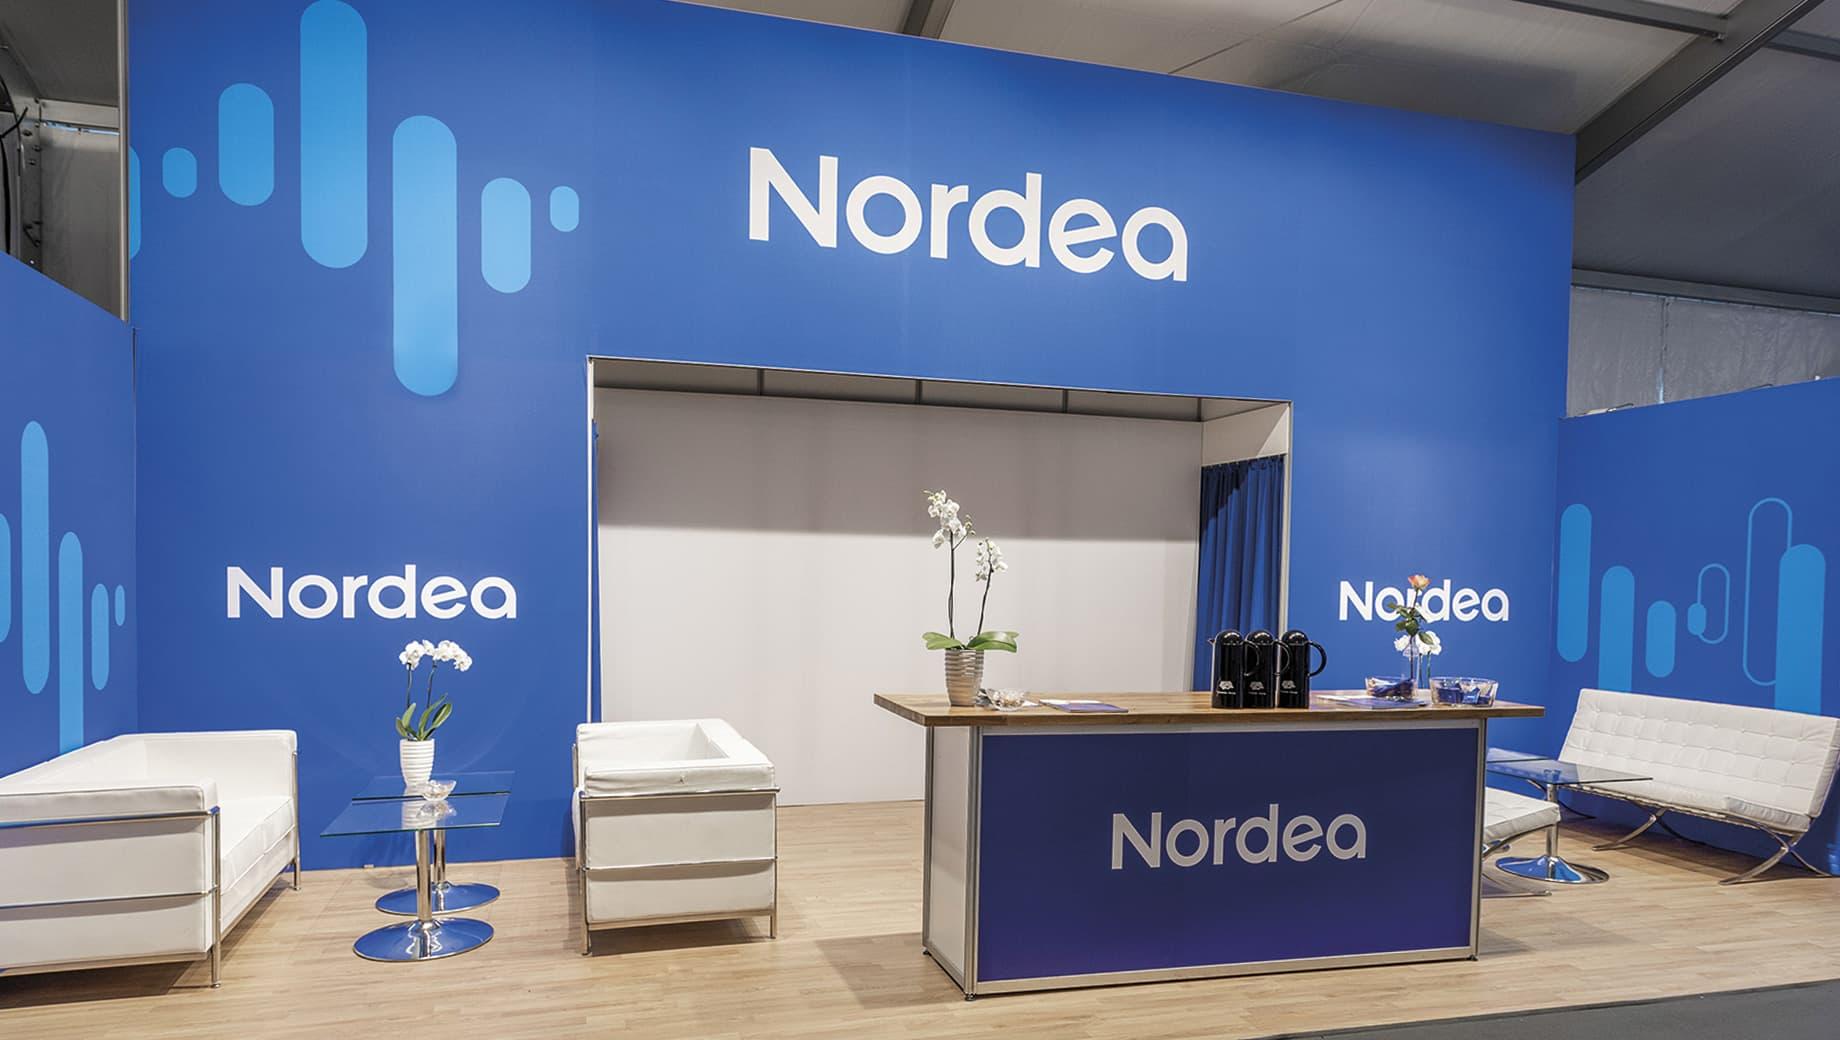 Nordea - Nor Fishing